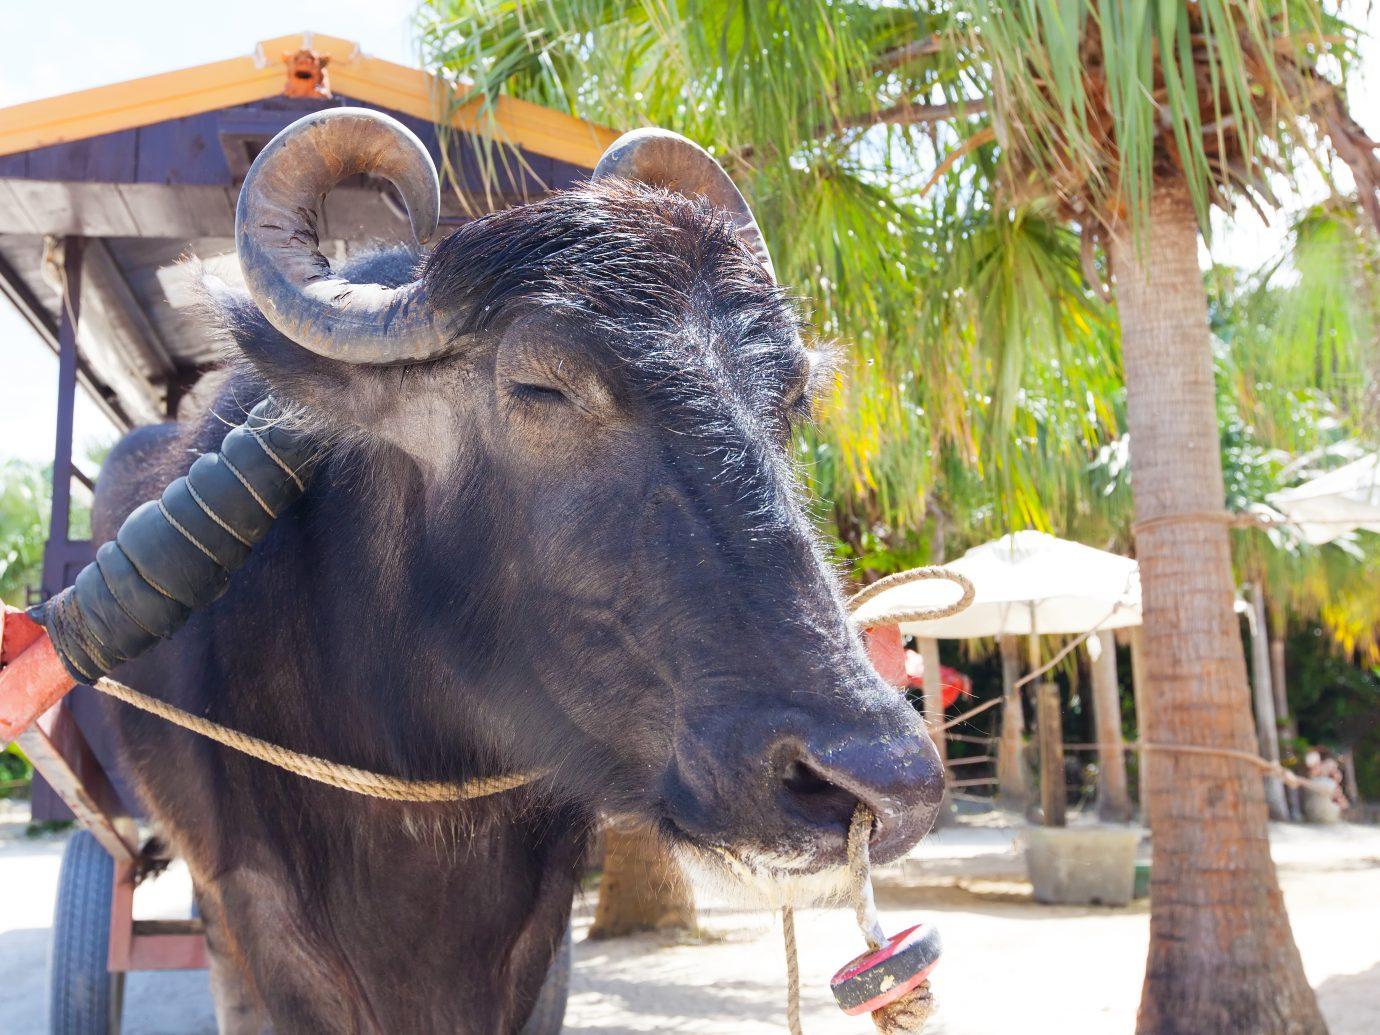 traditional water buffalo ride at taketomi island, japan